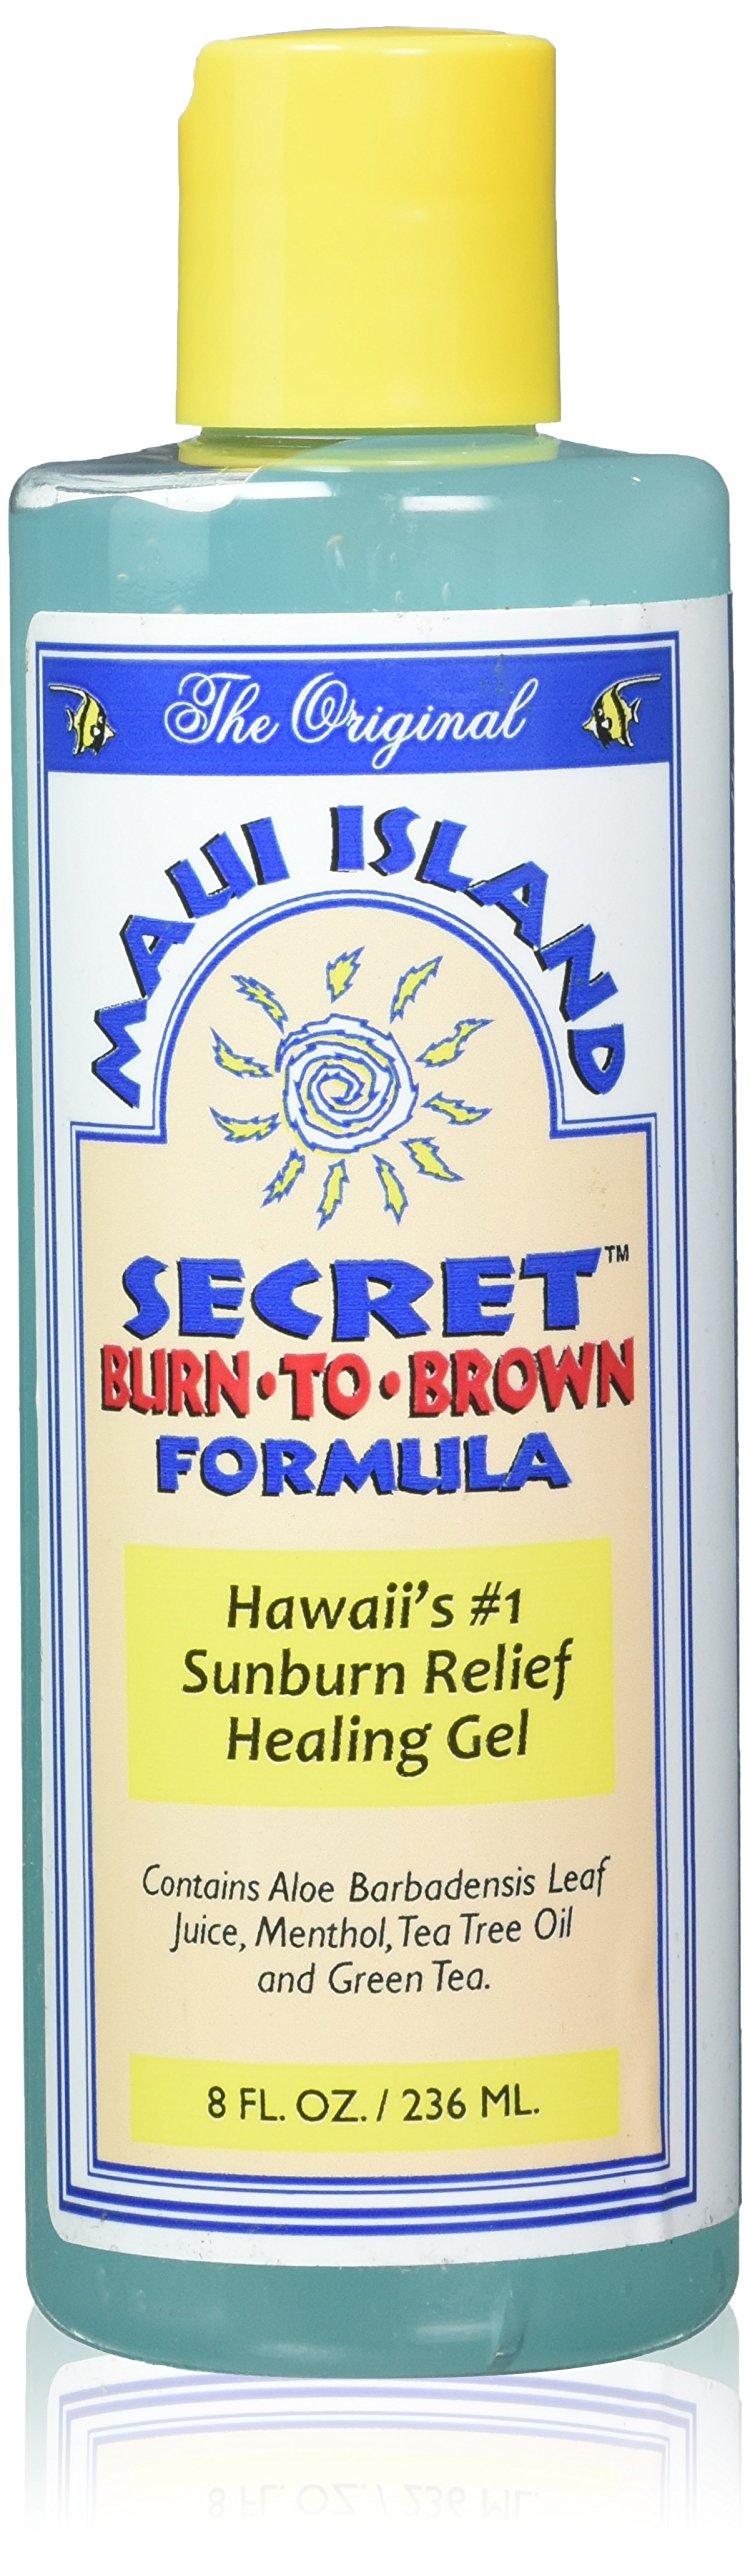 Maui Island Secret Burn to Brown Formula 8 Oz.